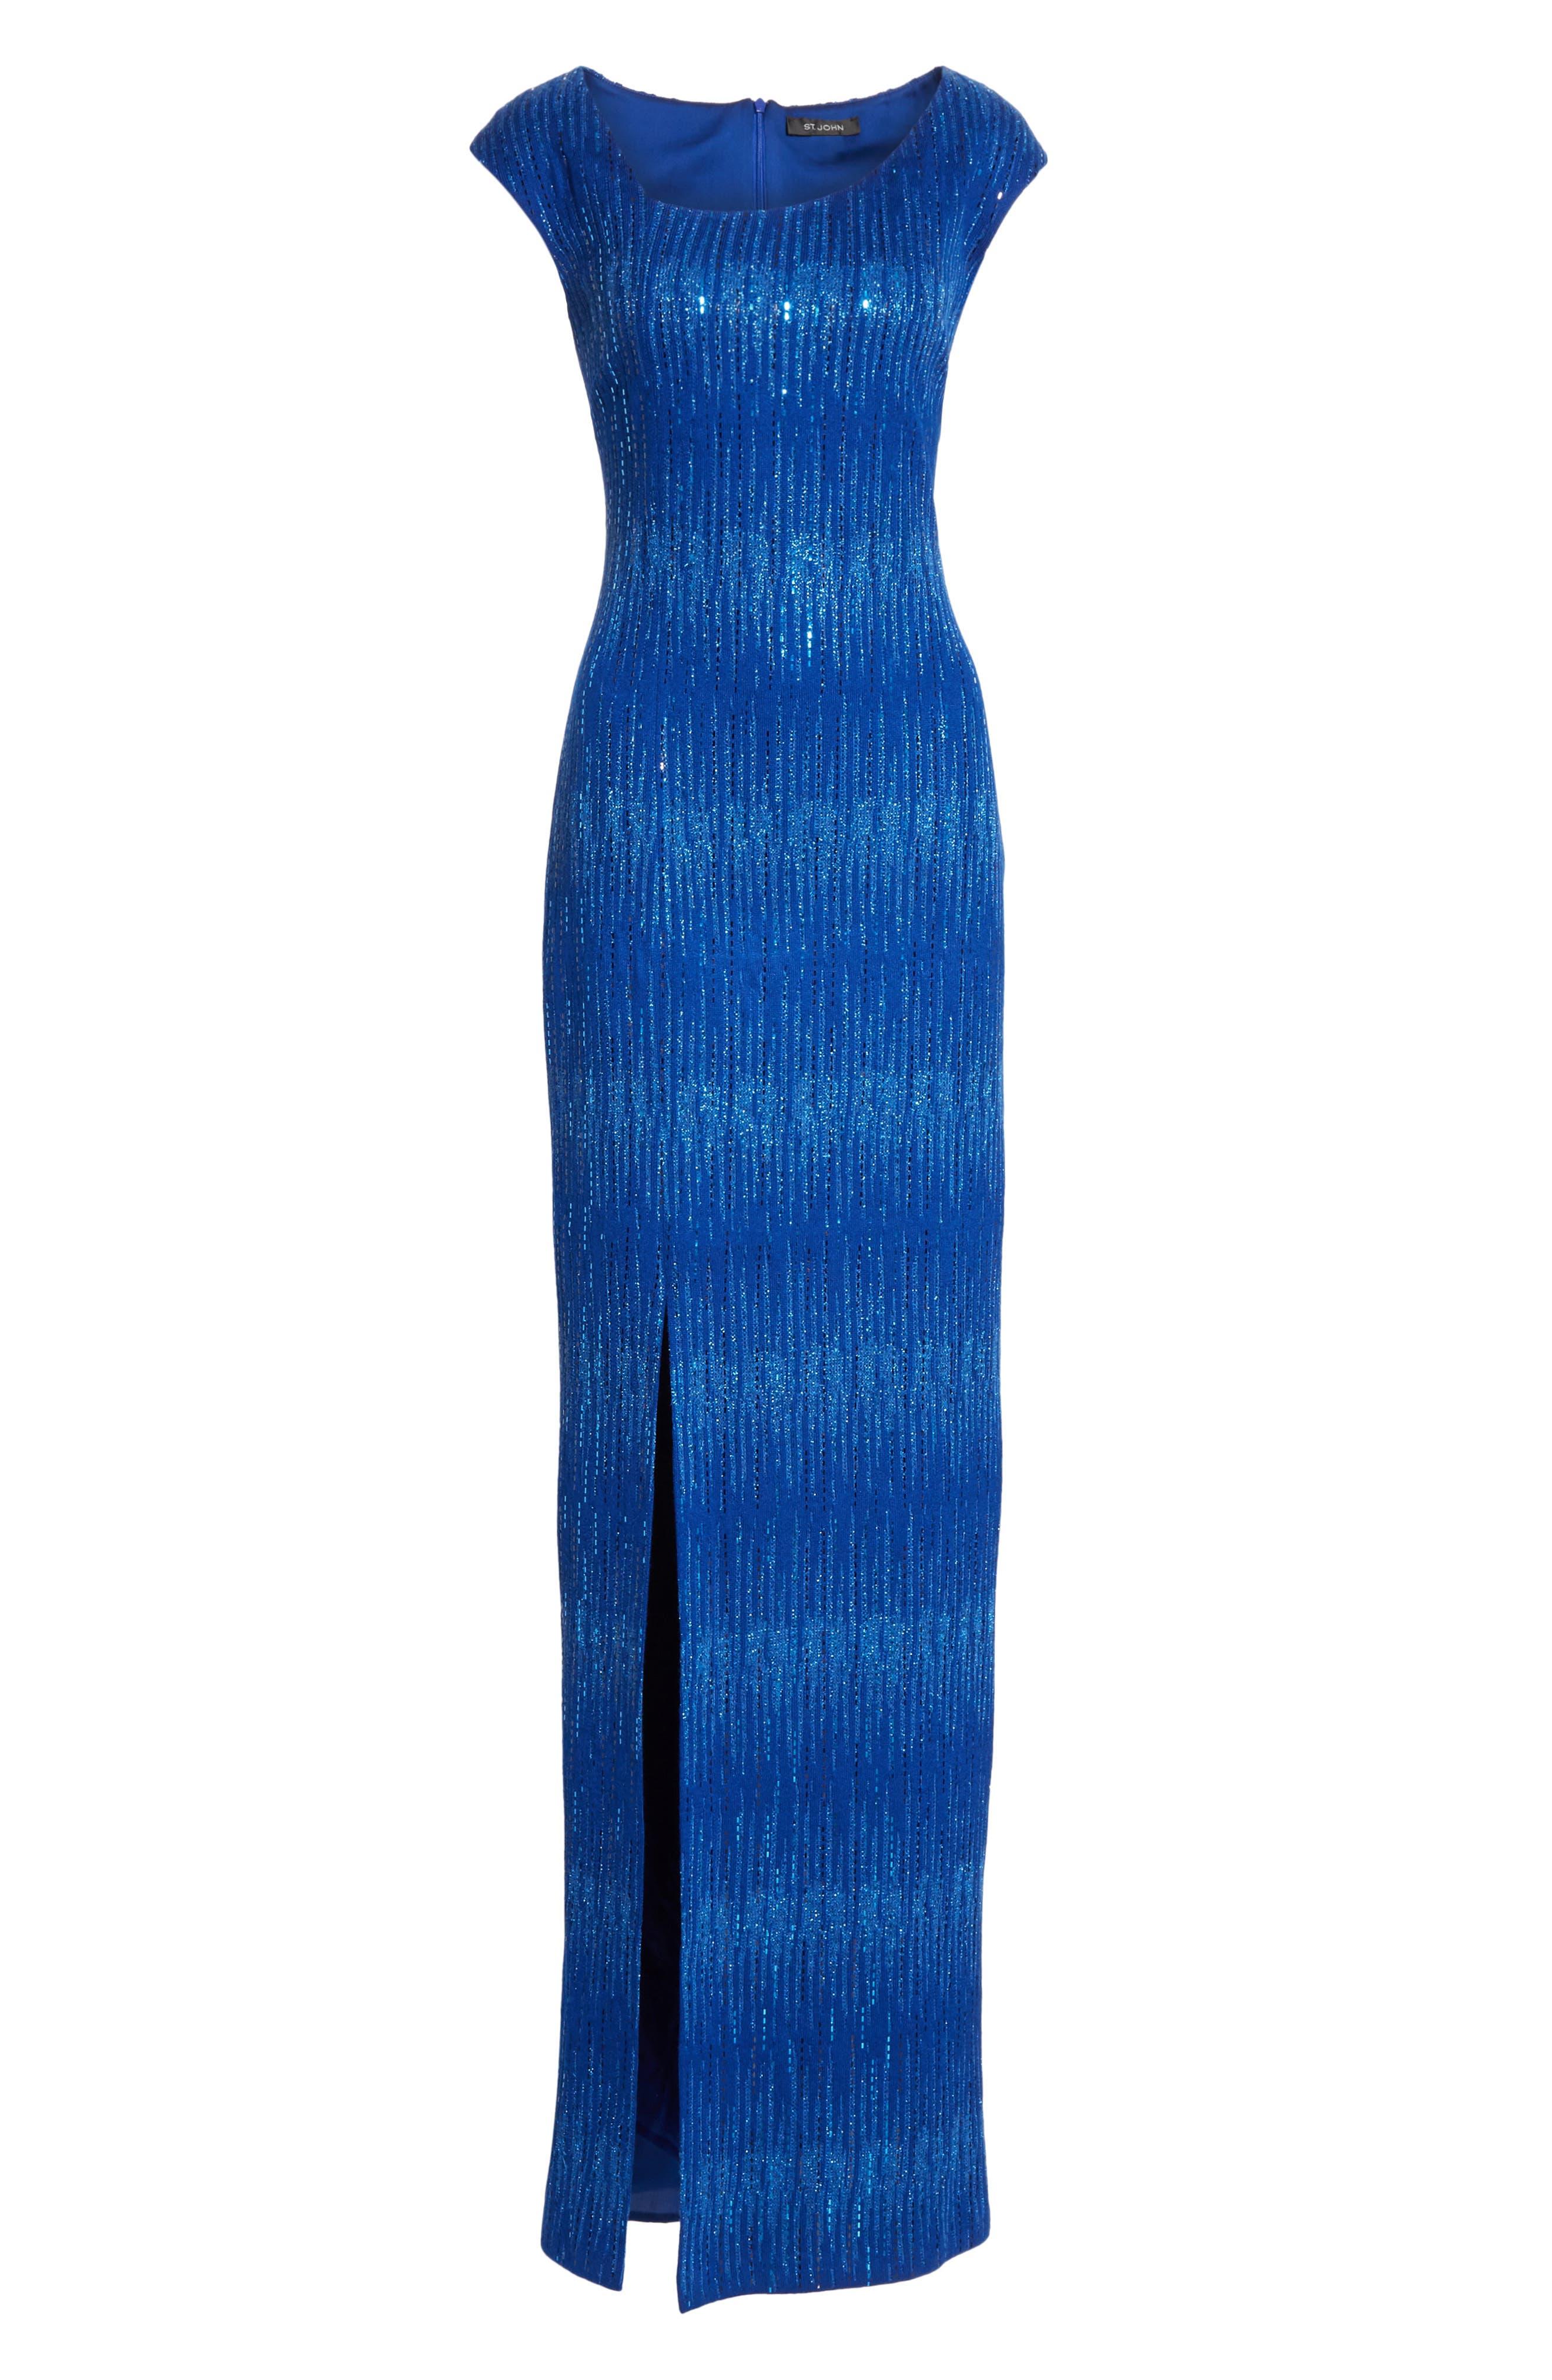 ST. JOHN COLLECTION, Asymmetrical Neck Carrie Knit Evening Dress, Alternate thumbnail 6, color, AZUL